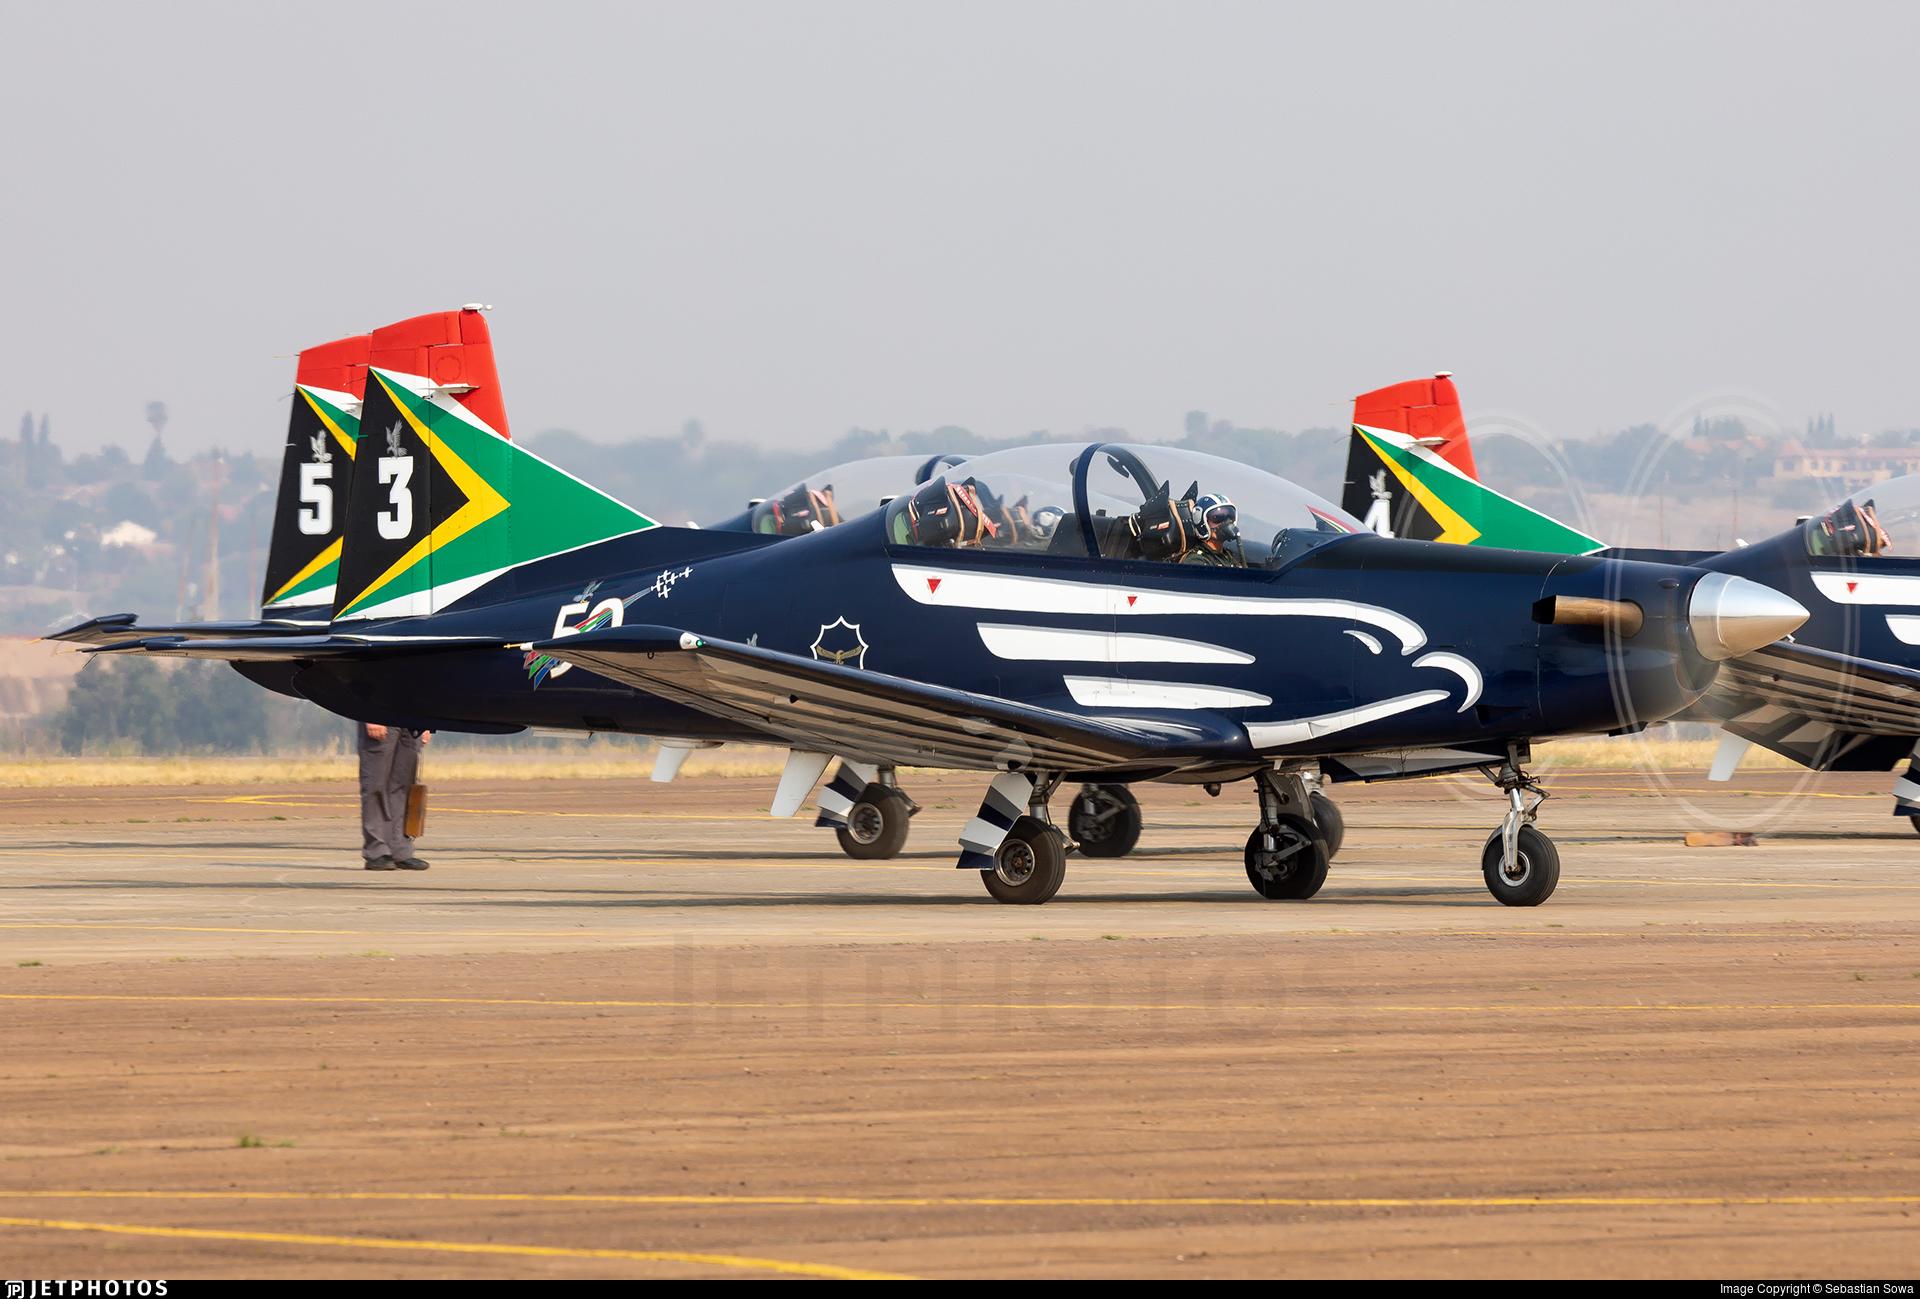 2019 - Pilatus PC-7 Mk.II - South Africa - Air Force